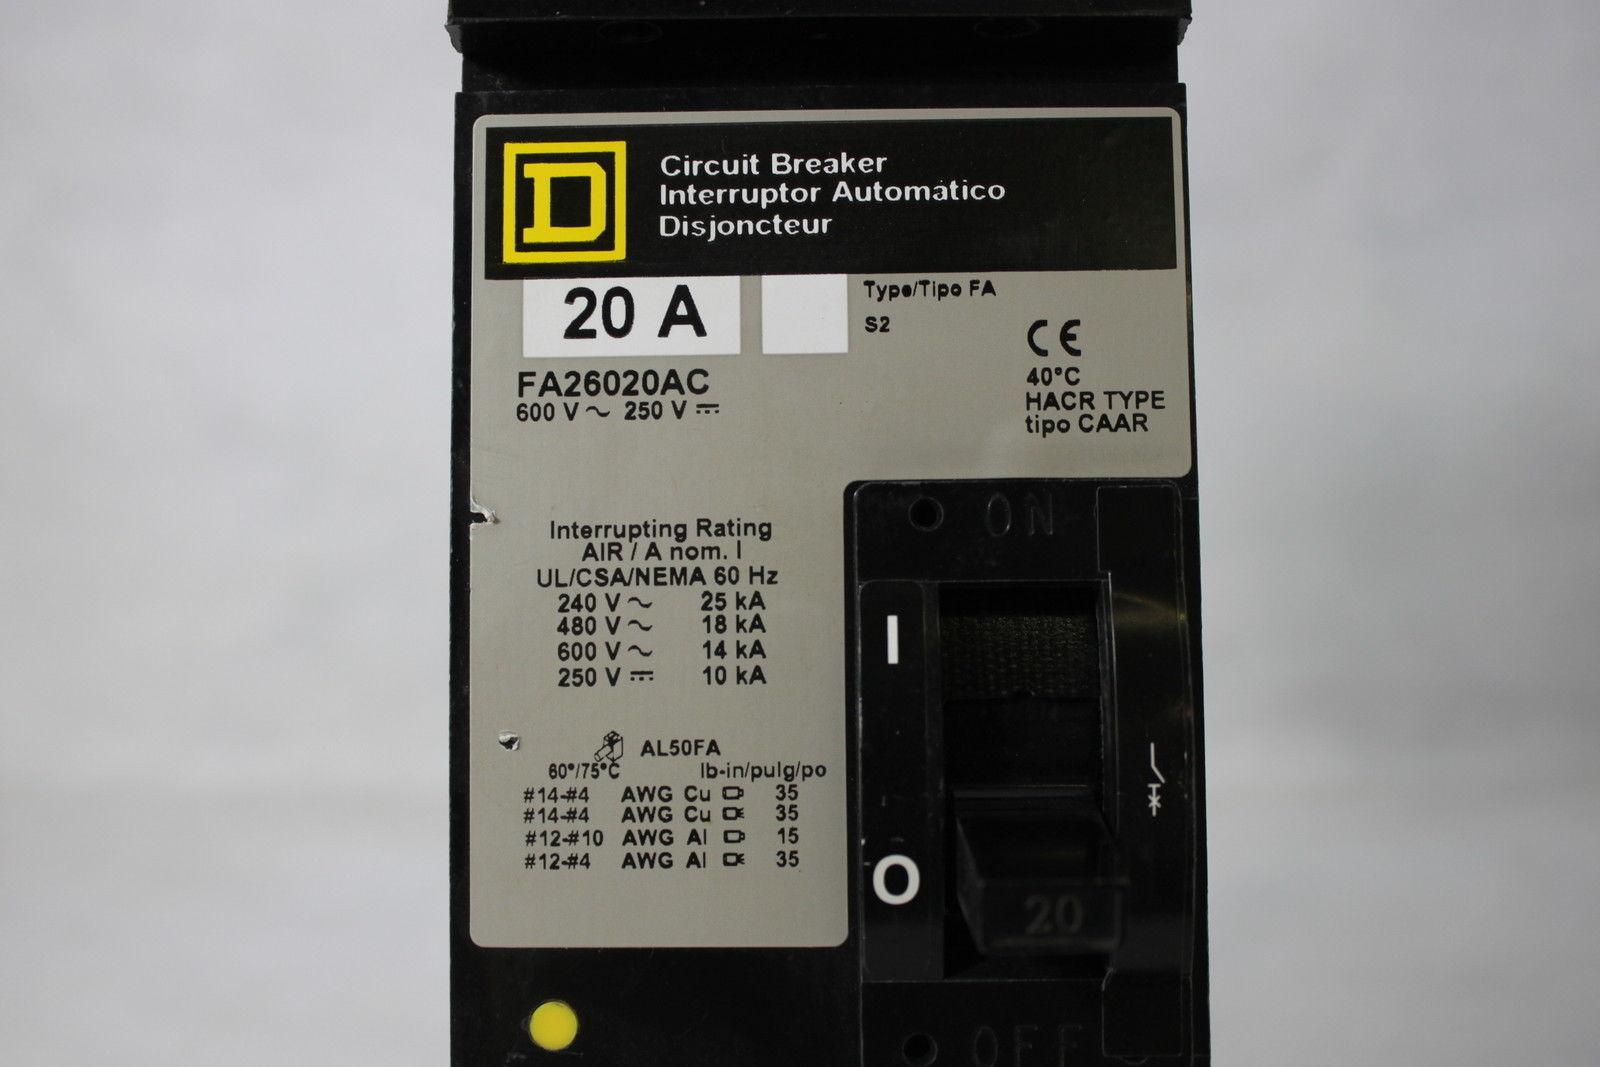 Square D 20A Circuit Breaker Interruptor FA26020AC Type FA 600V CAAR